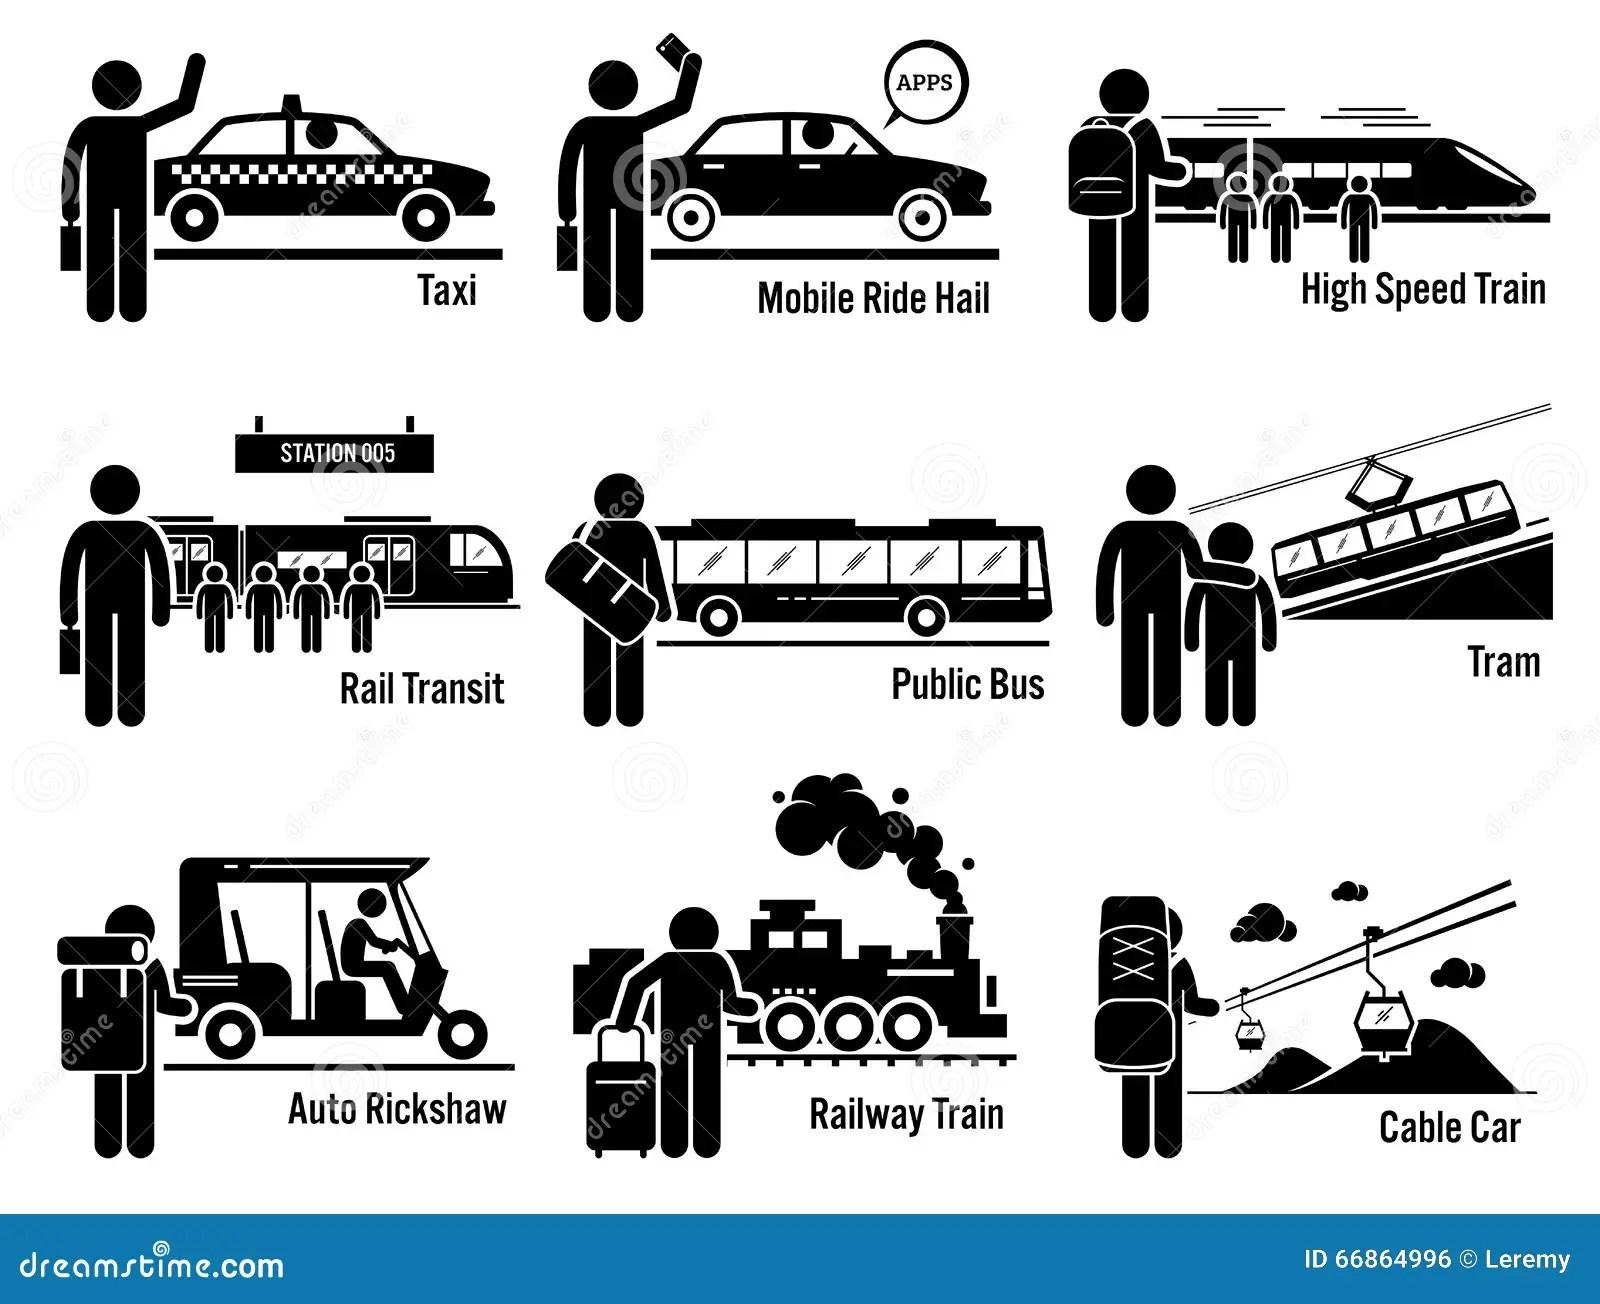 Land Public Transportation Vehicles And People Set Clipart